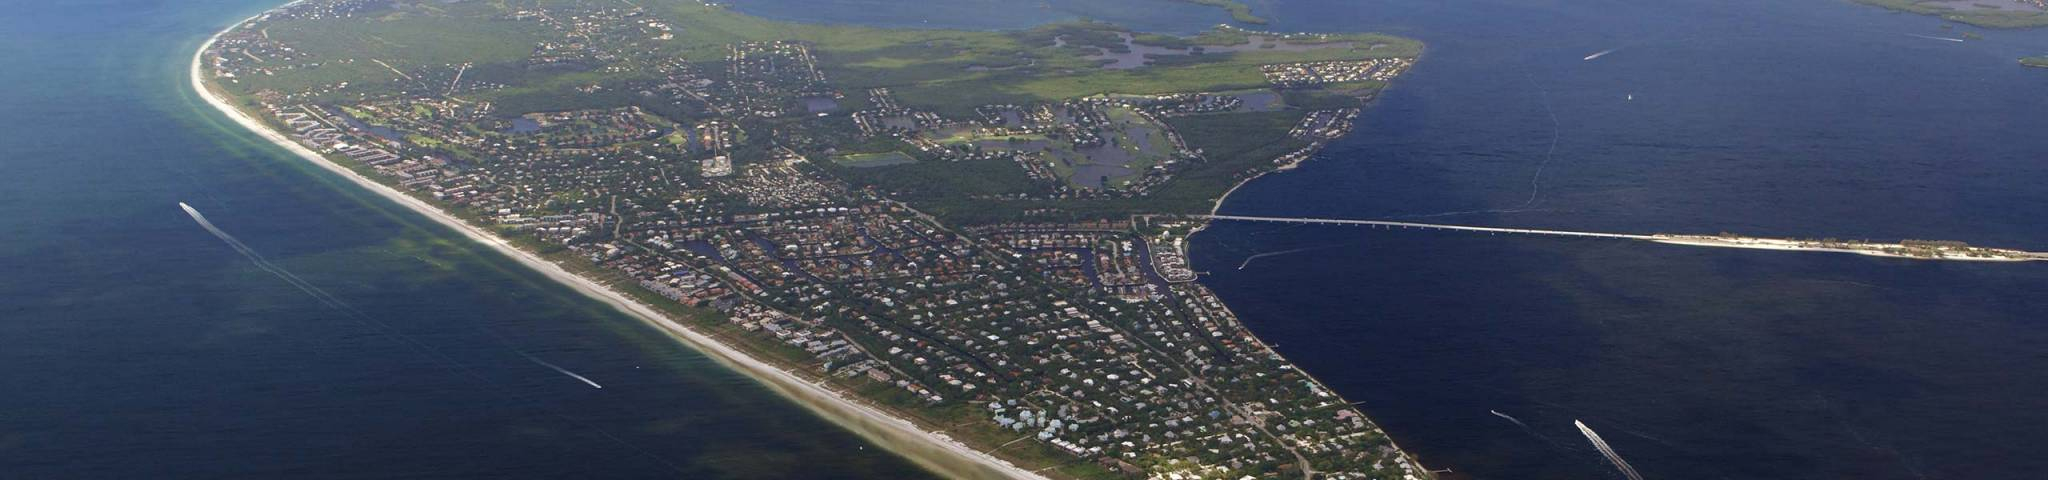 Sanibel Island Directions - Sanibel Island Map - Captiva Island Map - Street Map Of Sanibel Island Florida